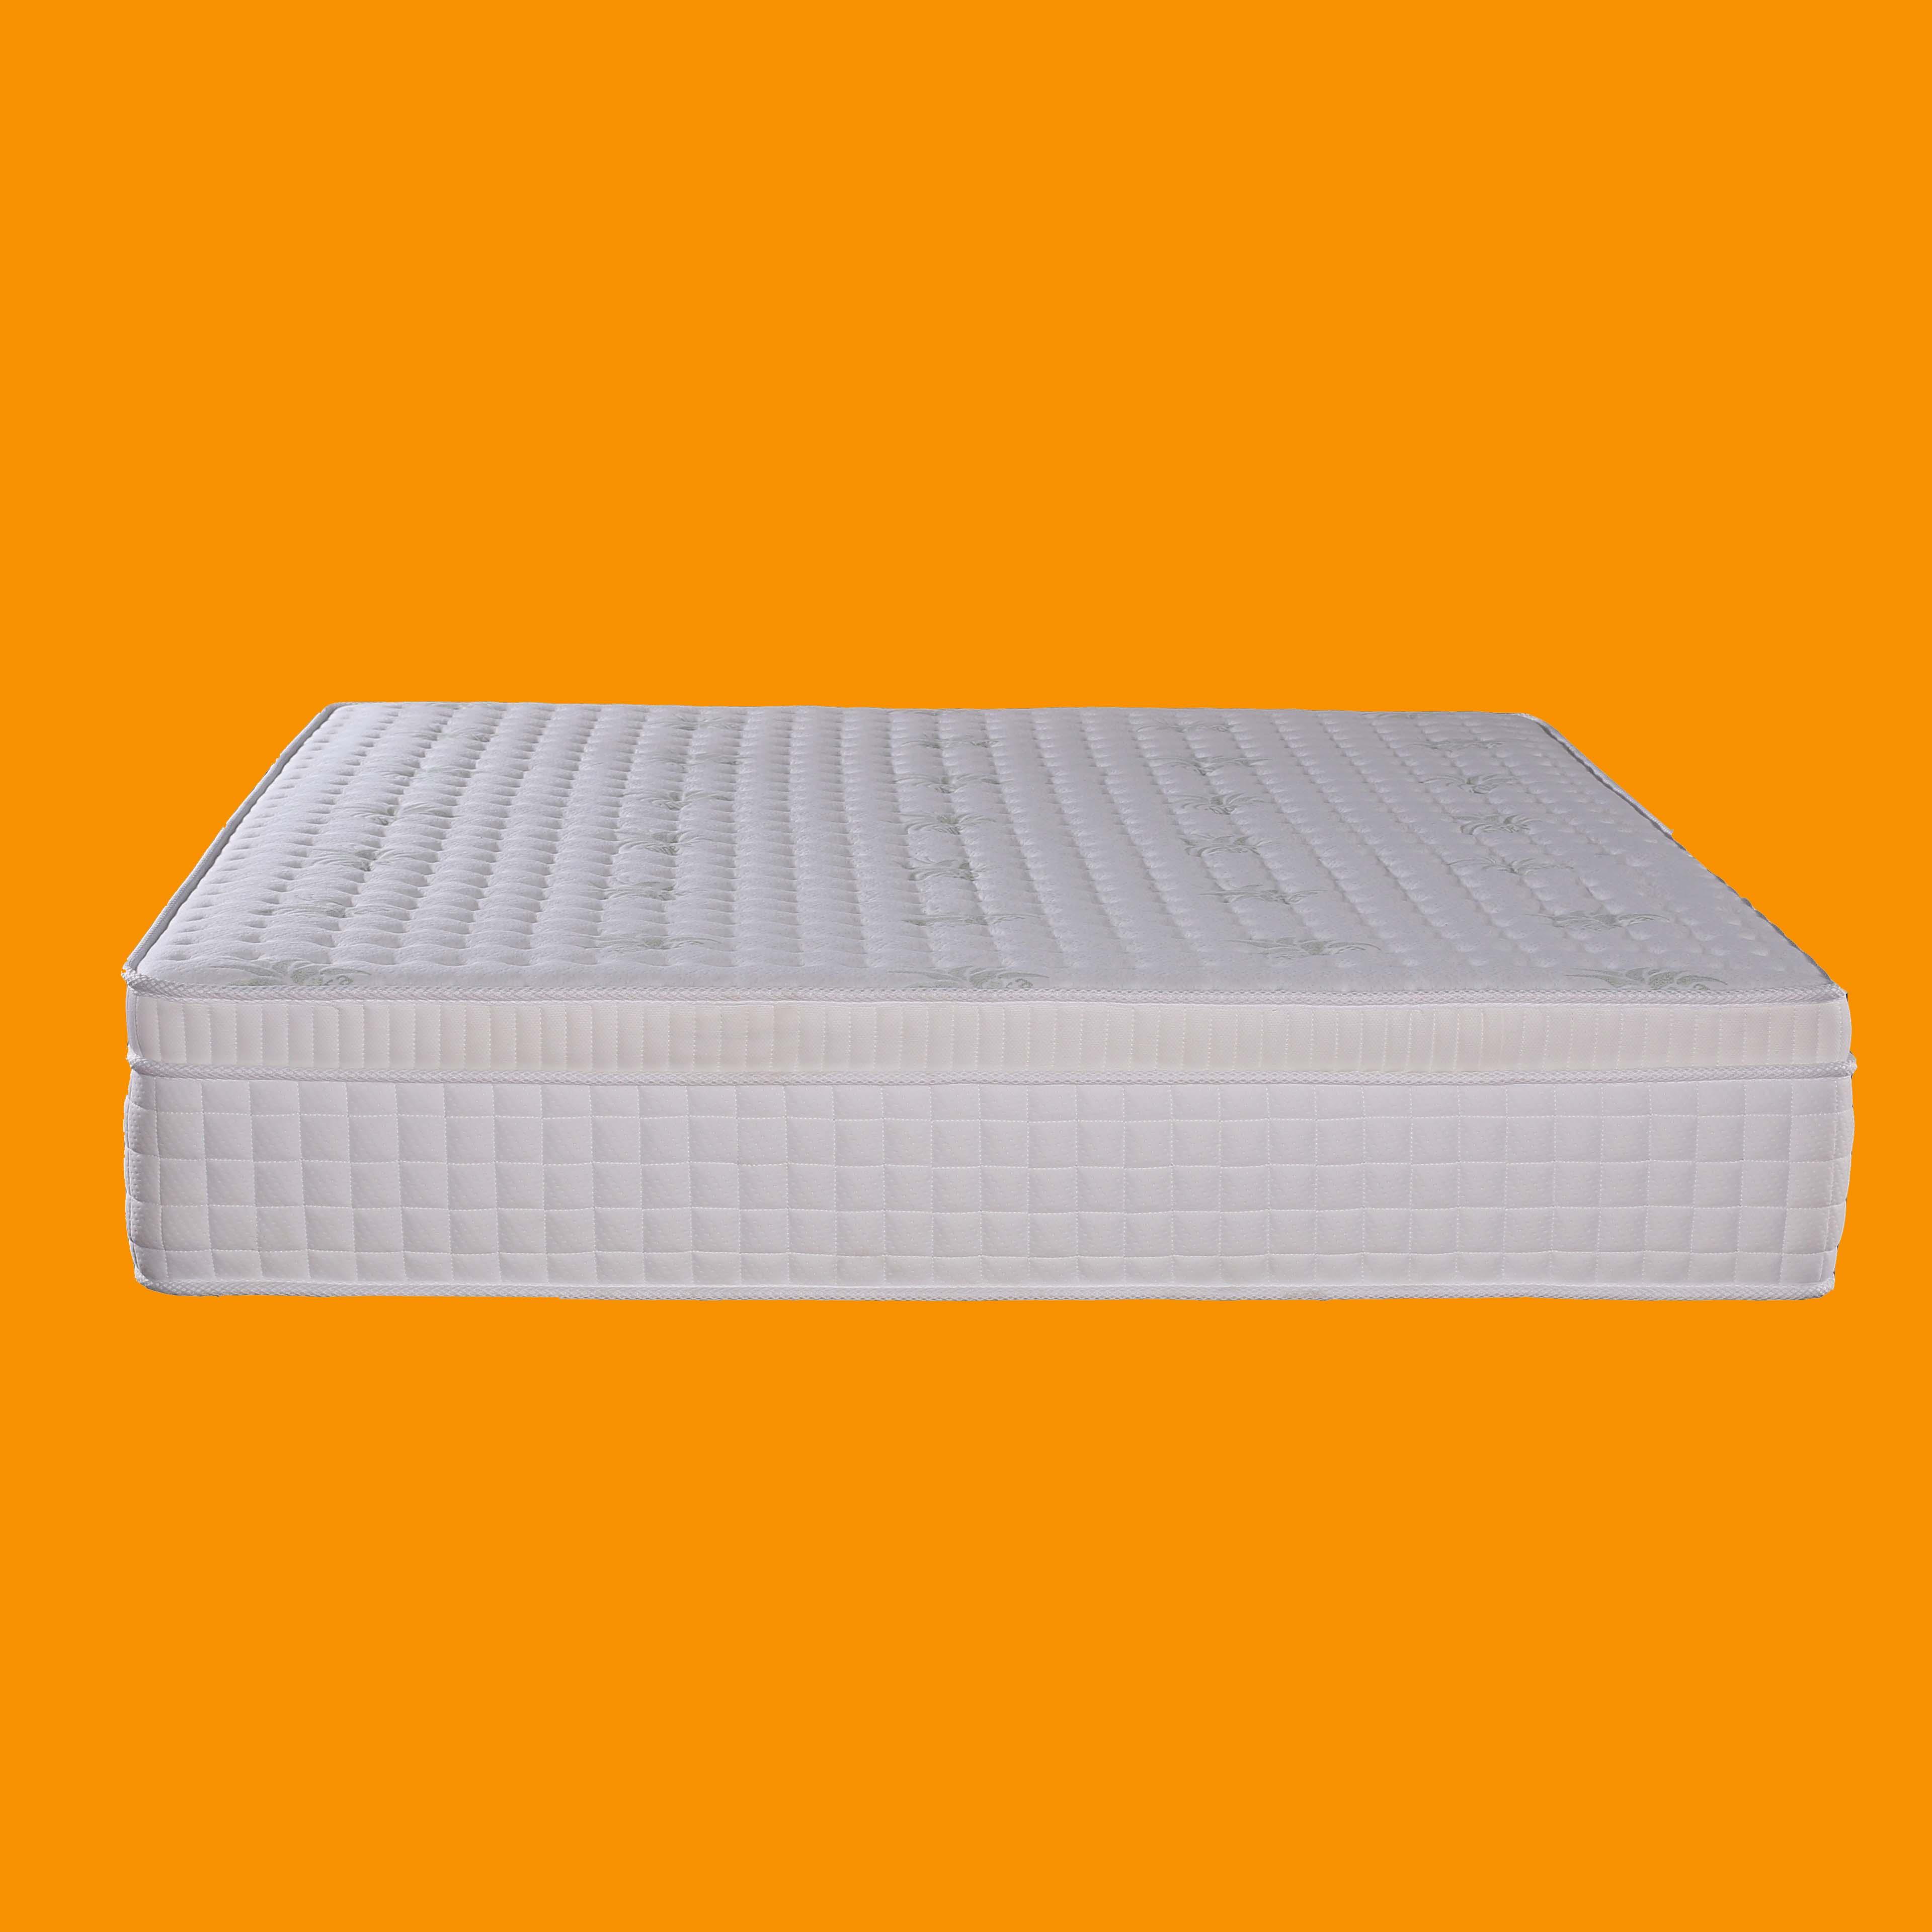 5 Star Roll Pack Euro Top Latex Foam Pocket Spring Hybrid Hotel Mattress 2019 hot selling mattress - Jozy Mattress | Jozy.net